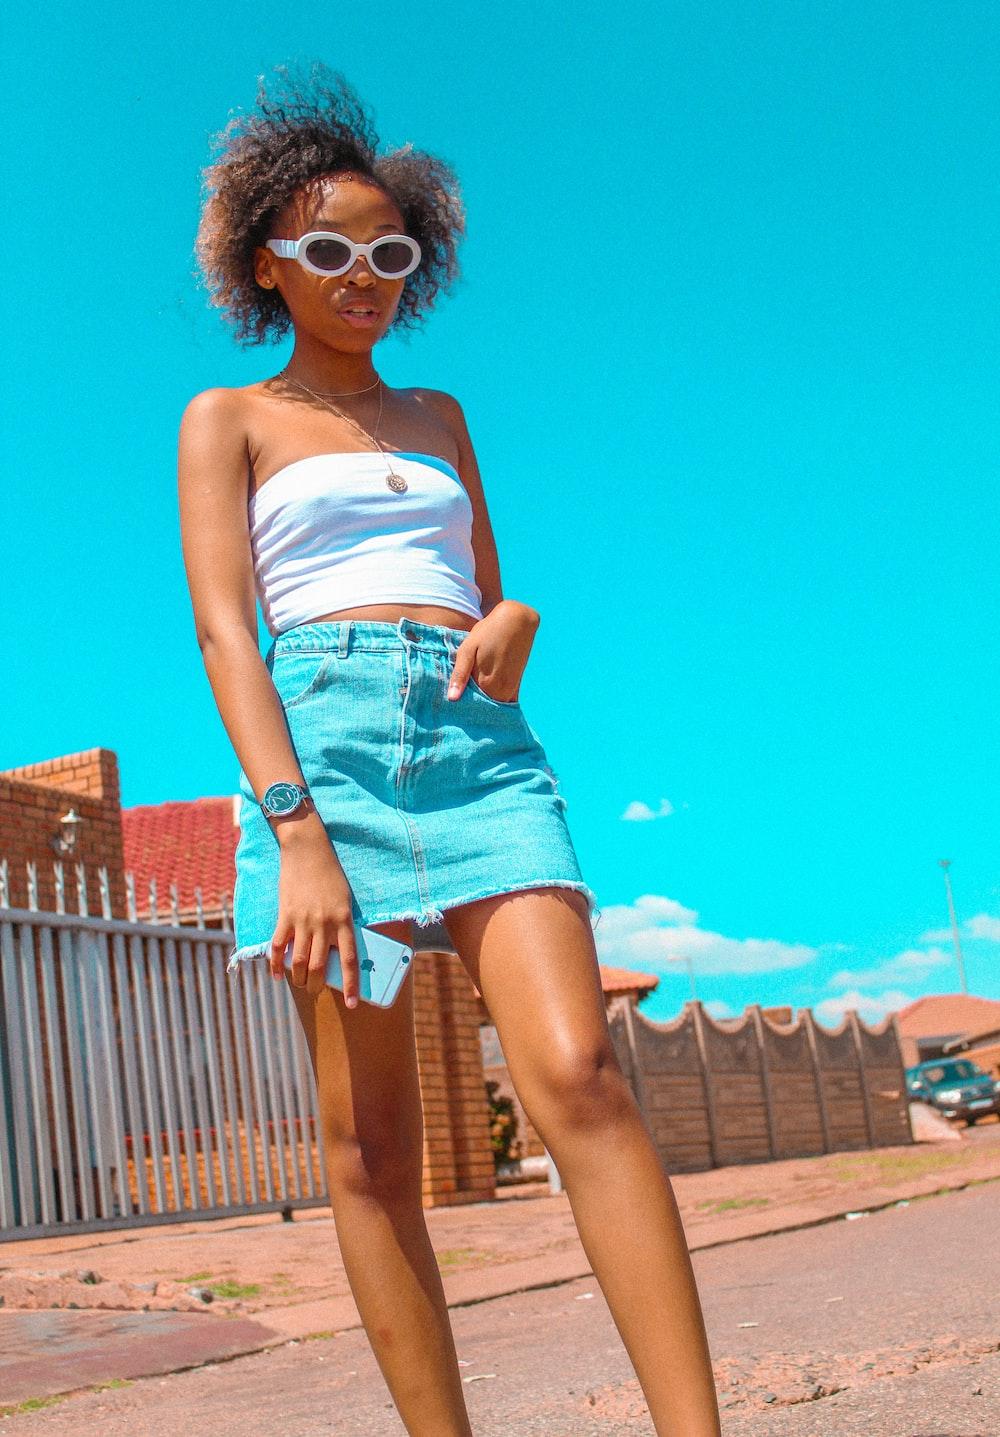 woman wearing white frame sunglasses